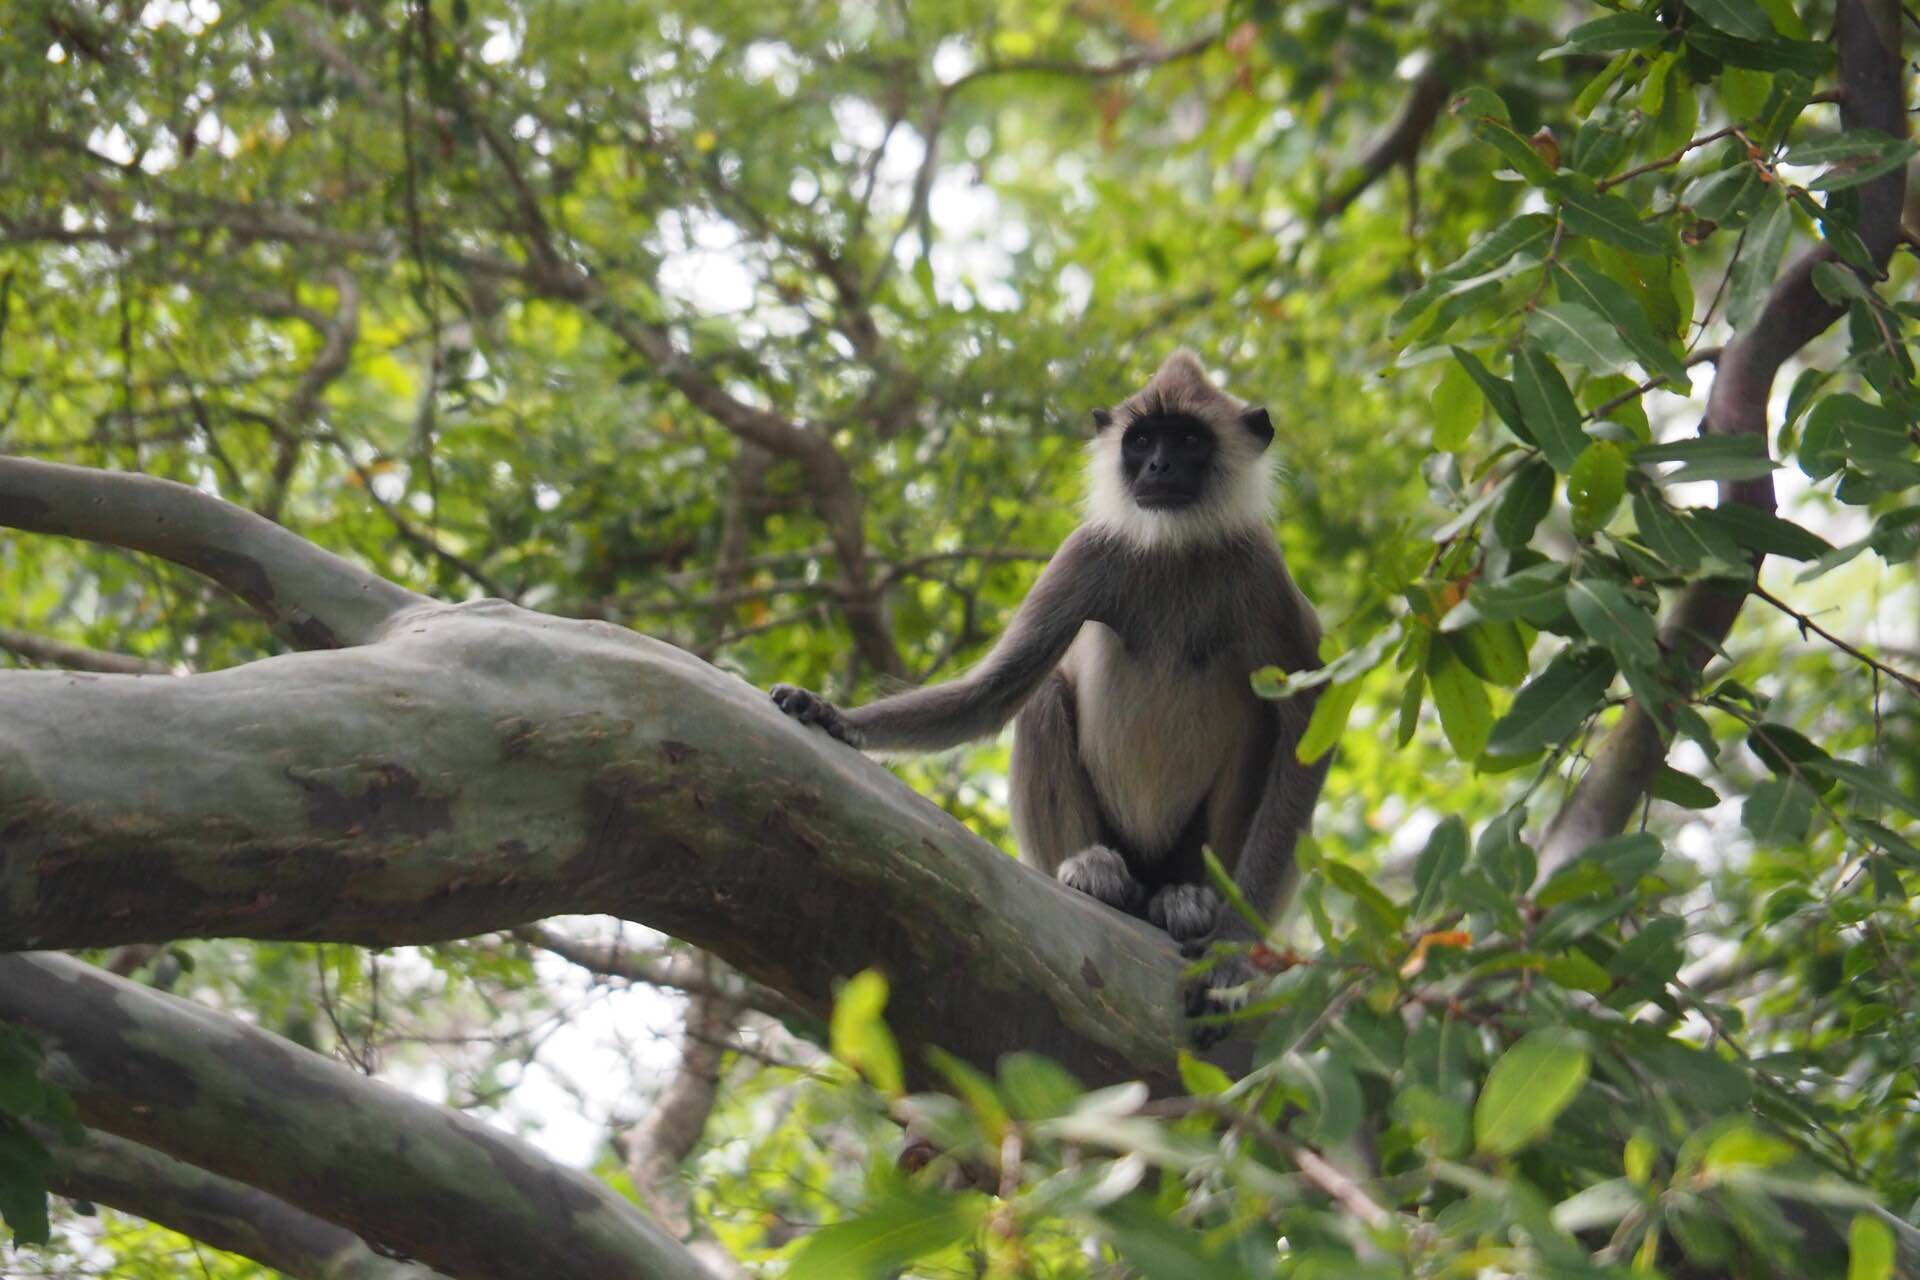 sri-lanka-monkey-tree-holiday-review-feedback-invite-to-paradise-quentin-kate-hulm.jpg